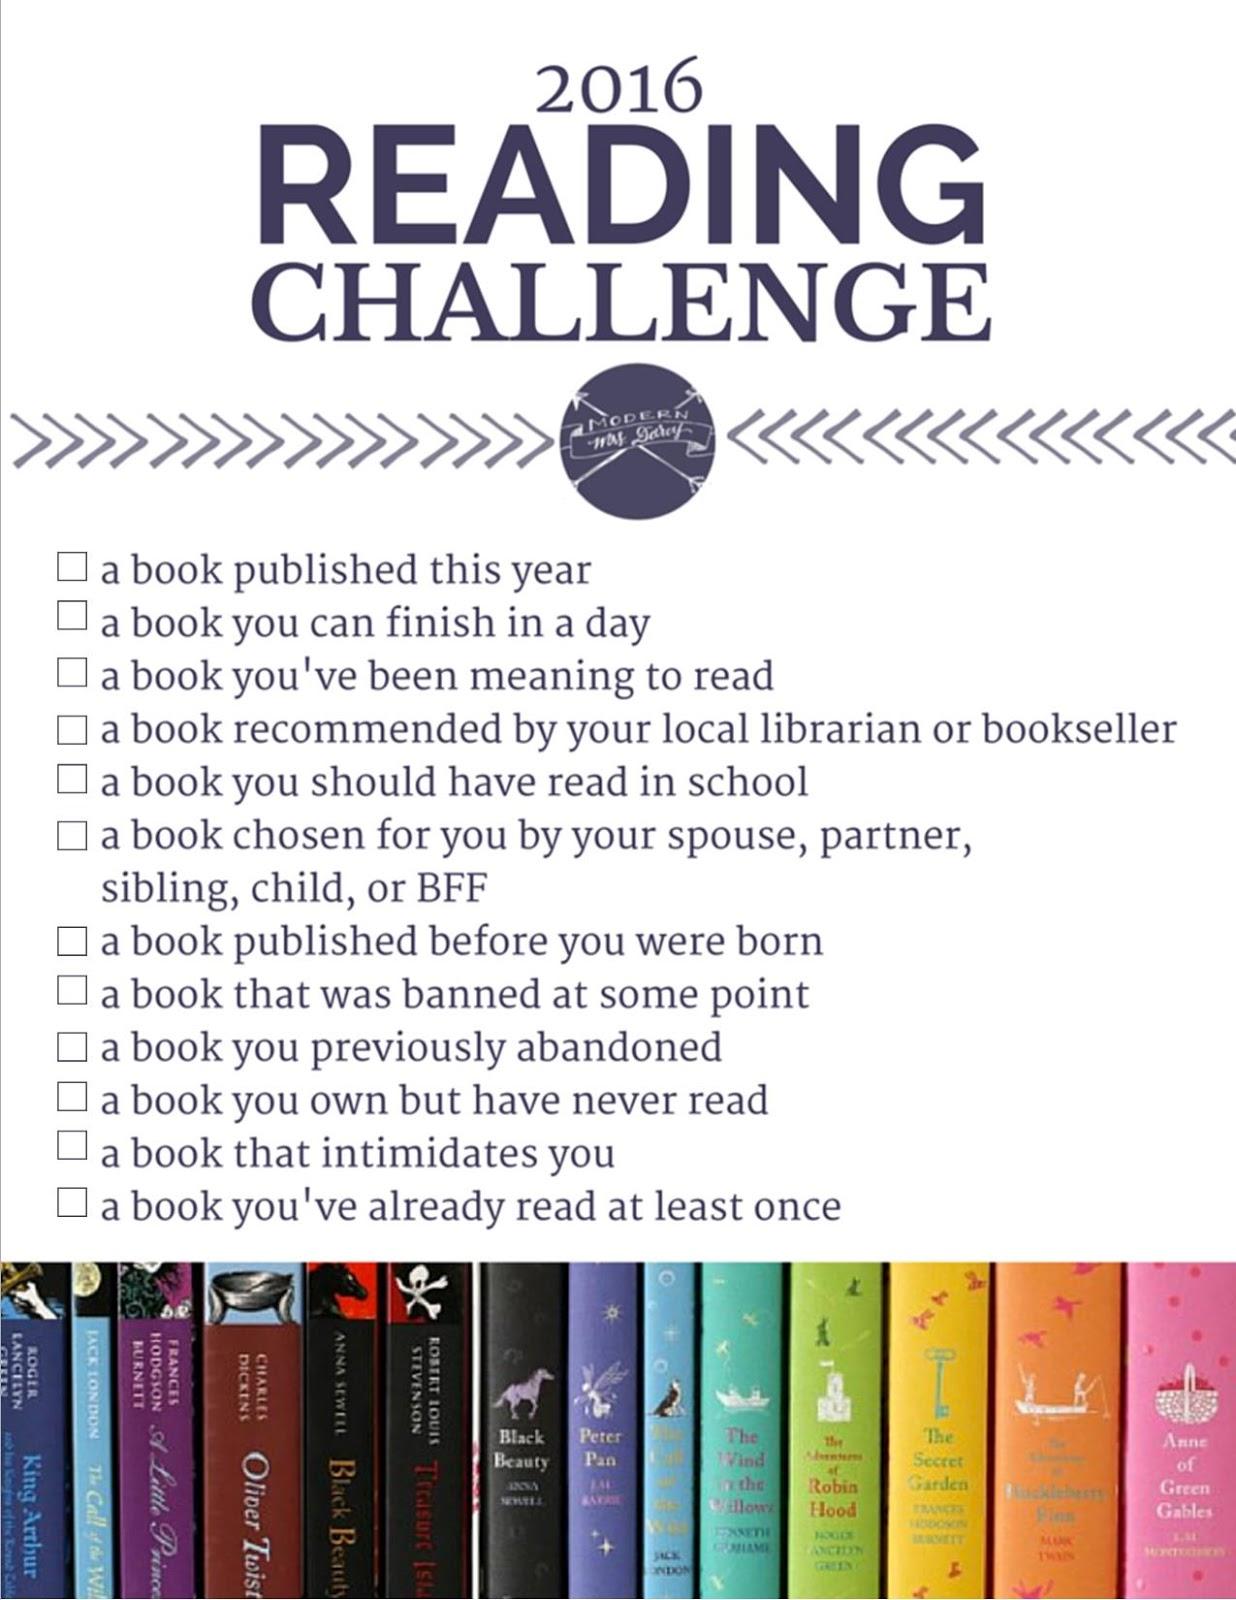 The 2018 Reading Challenge